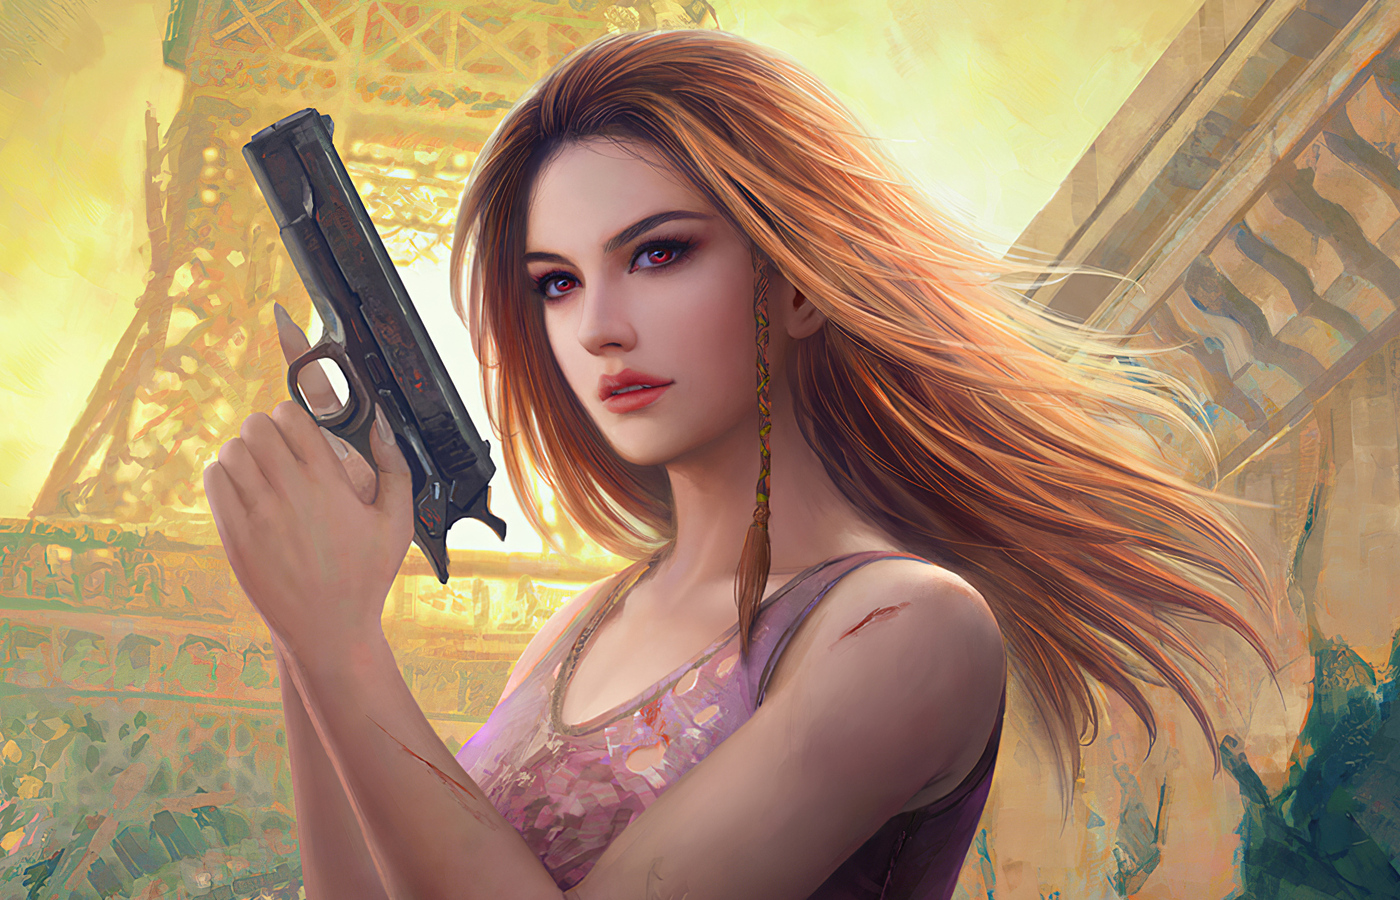 girl-with-gun-2020-7n.jpg